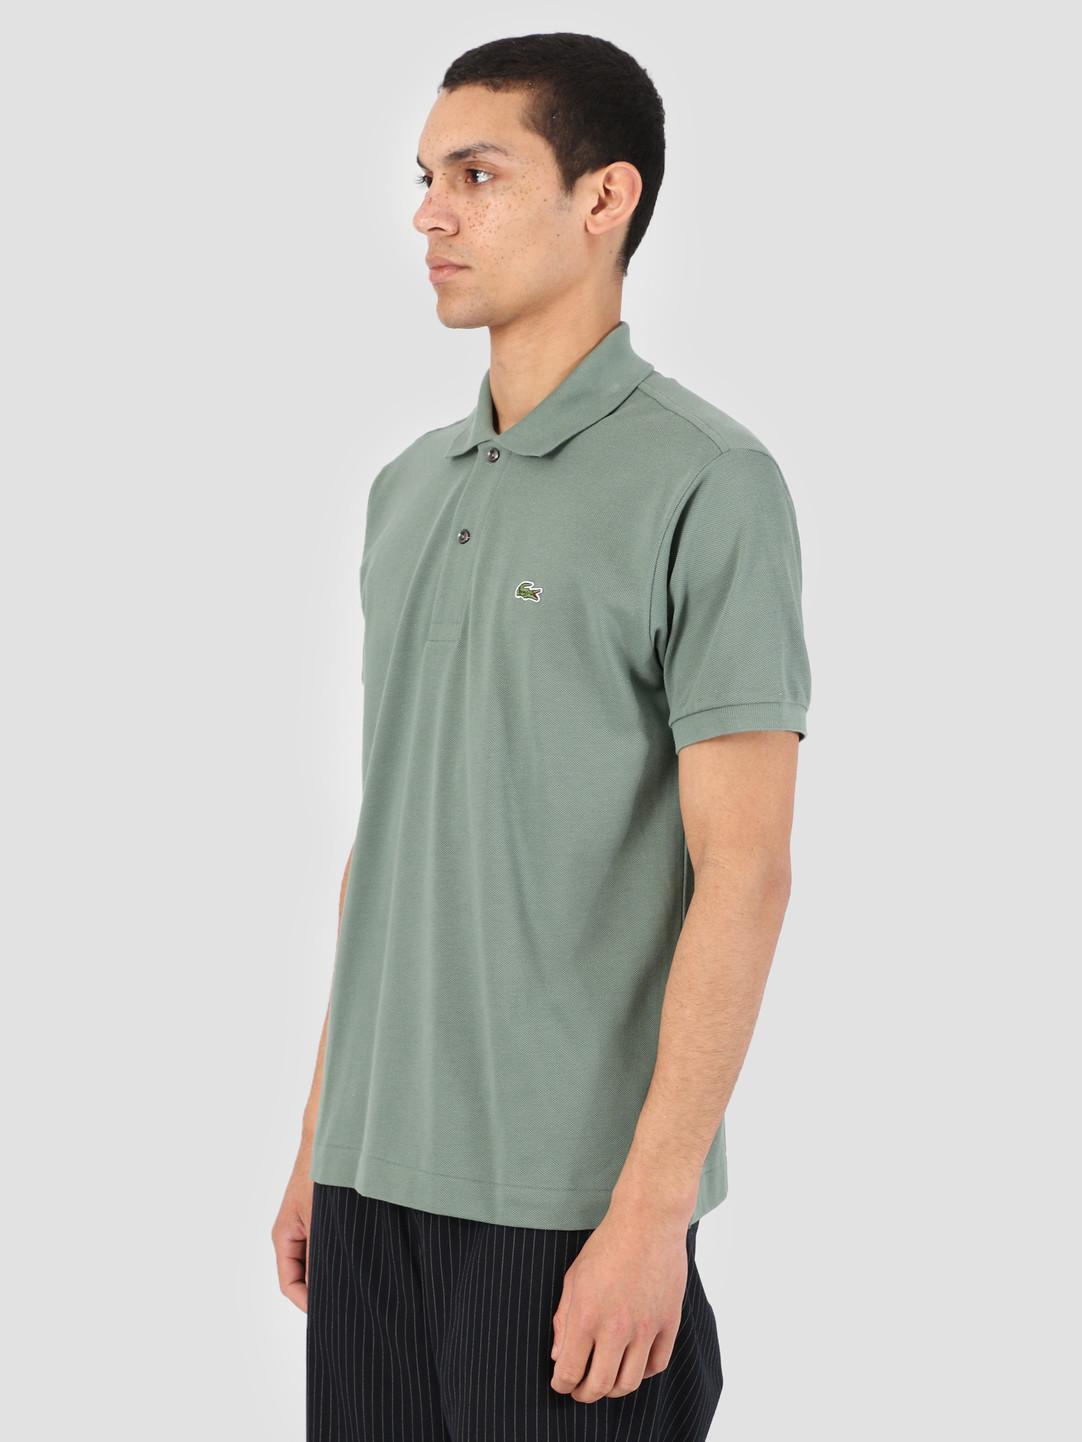 Lacoste Lacoste 1Hp1 Men'S T-Shirt Best Polo 011 Grassy L1212-91